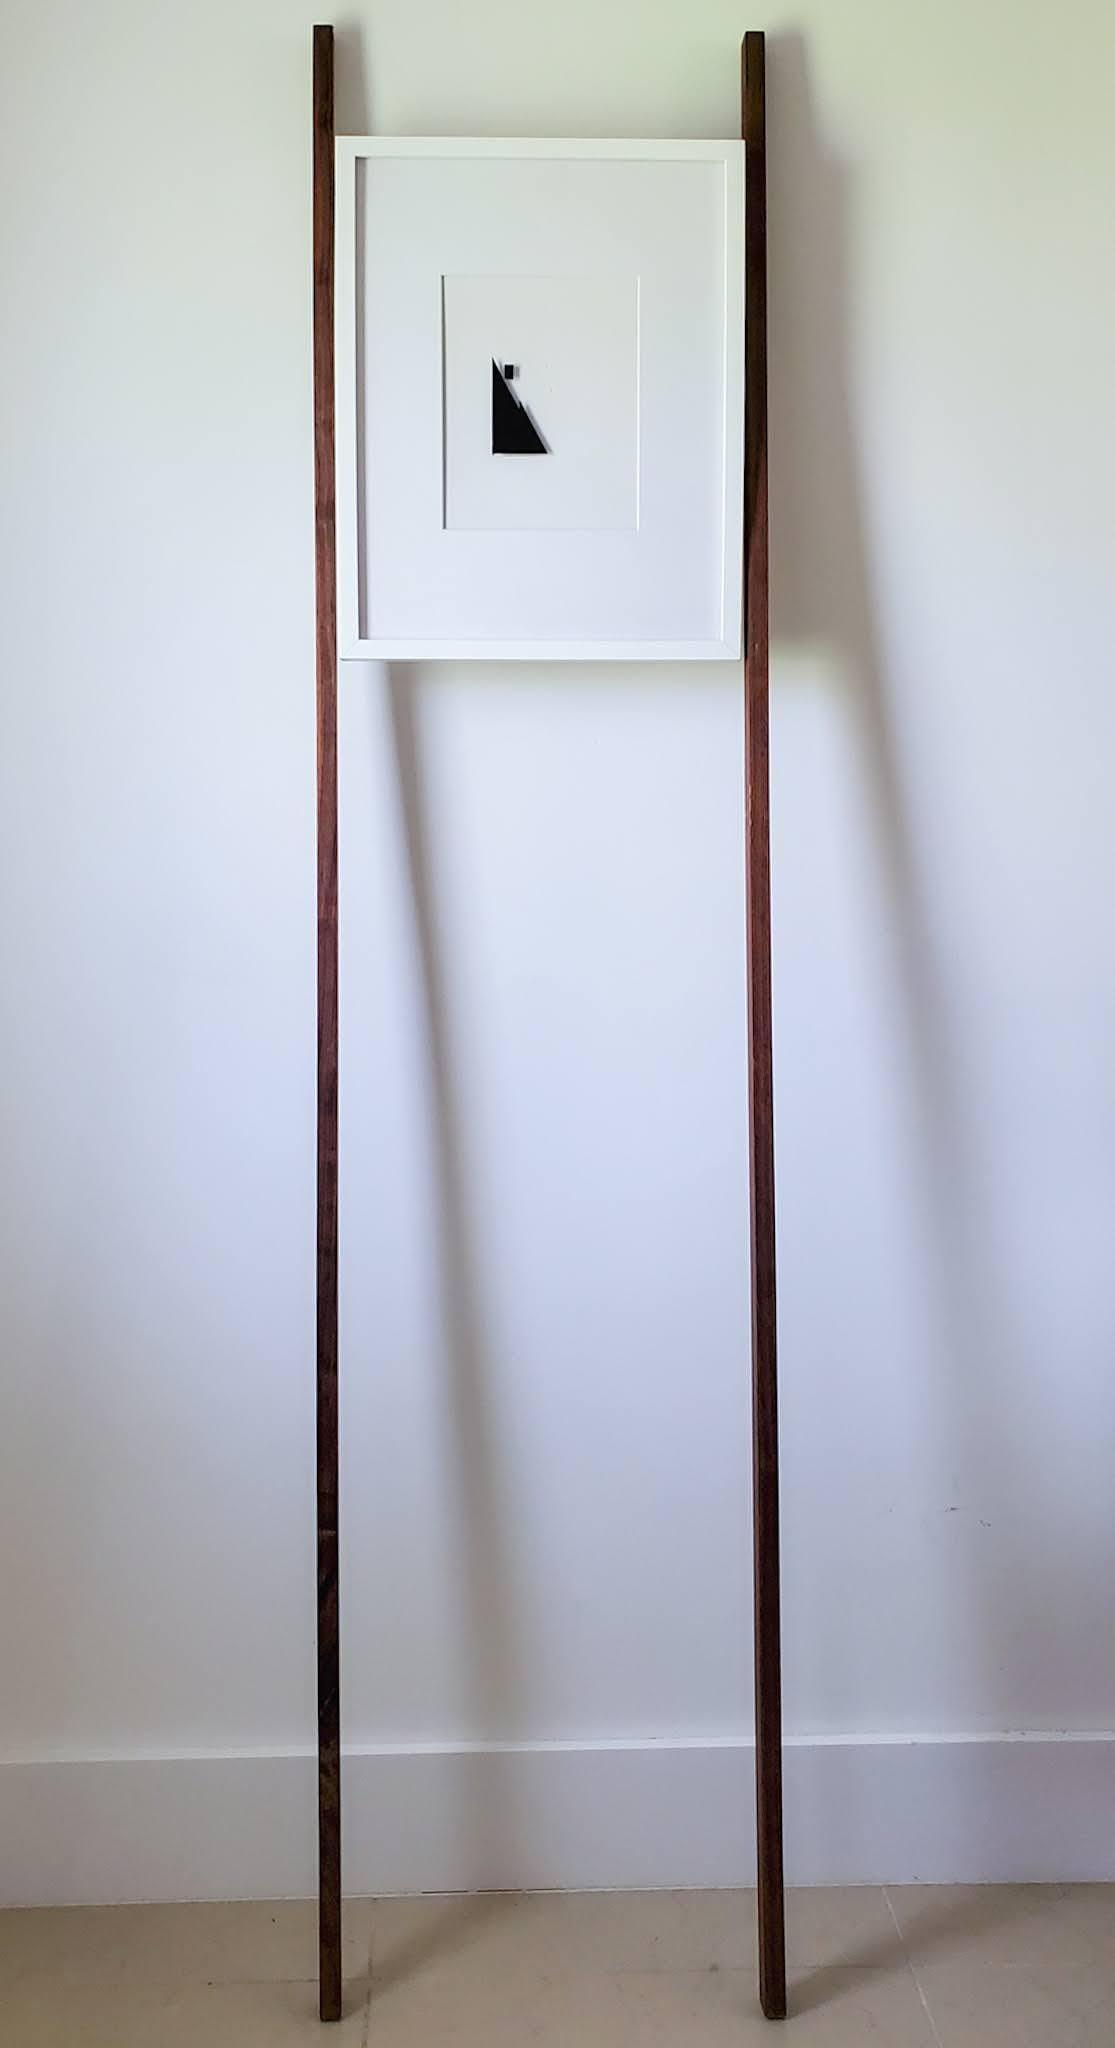 Imprints / I Am Yourself: Window. Art wall installation